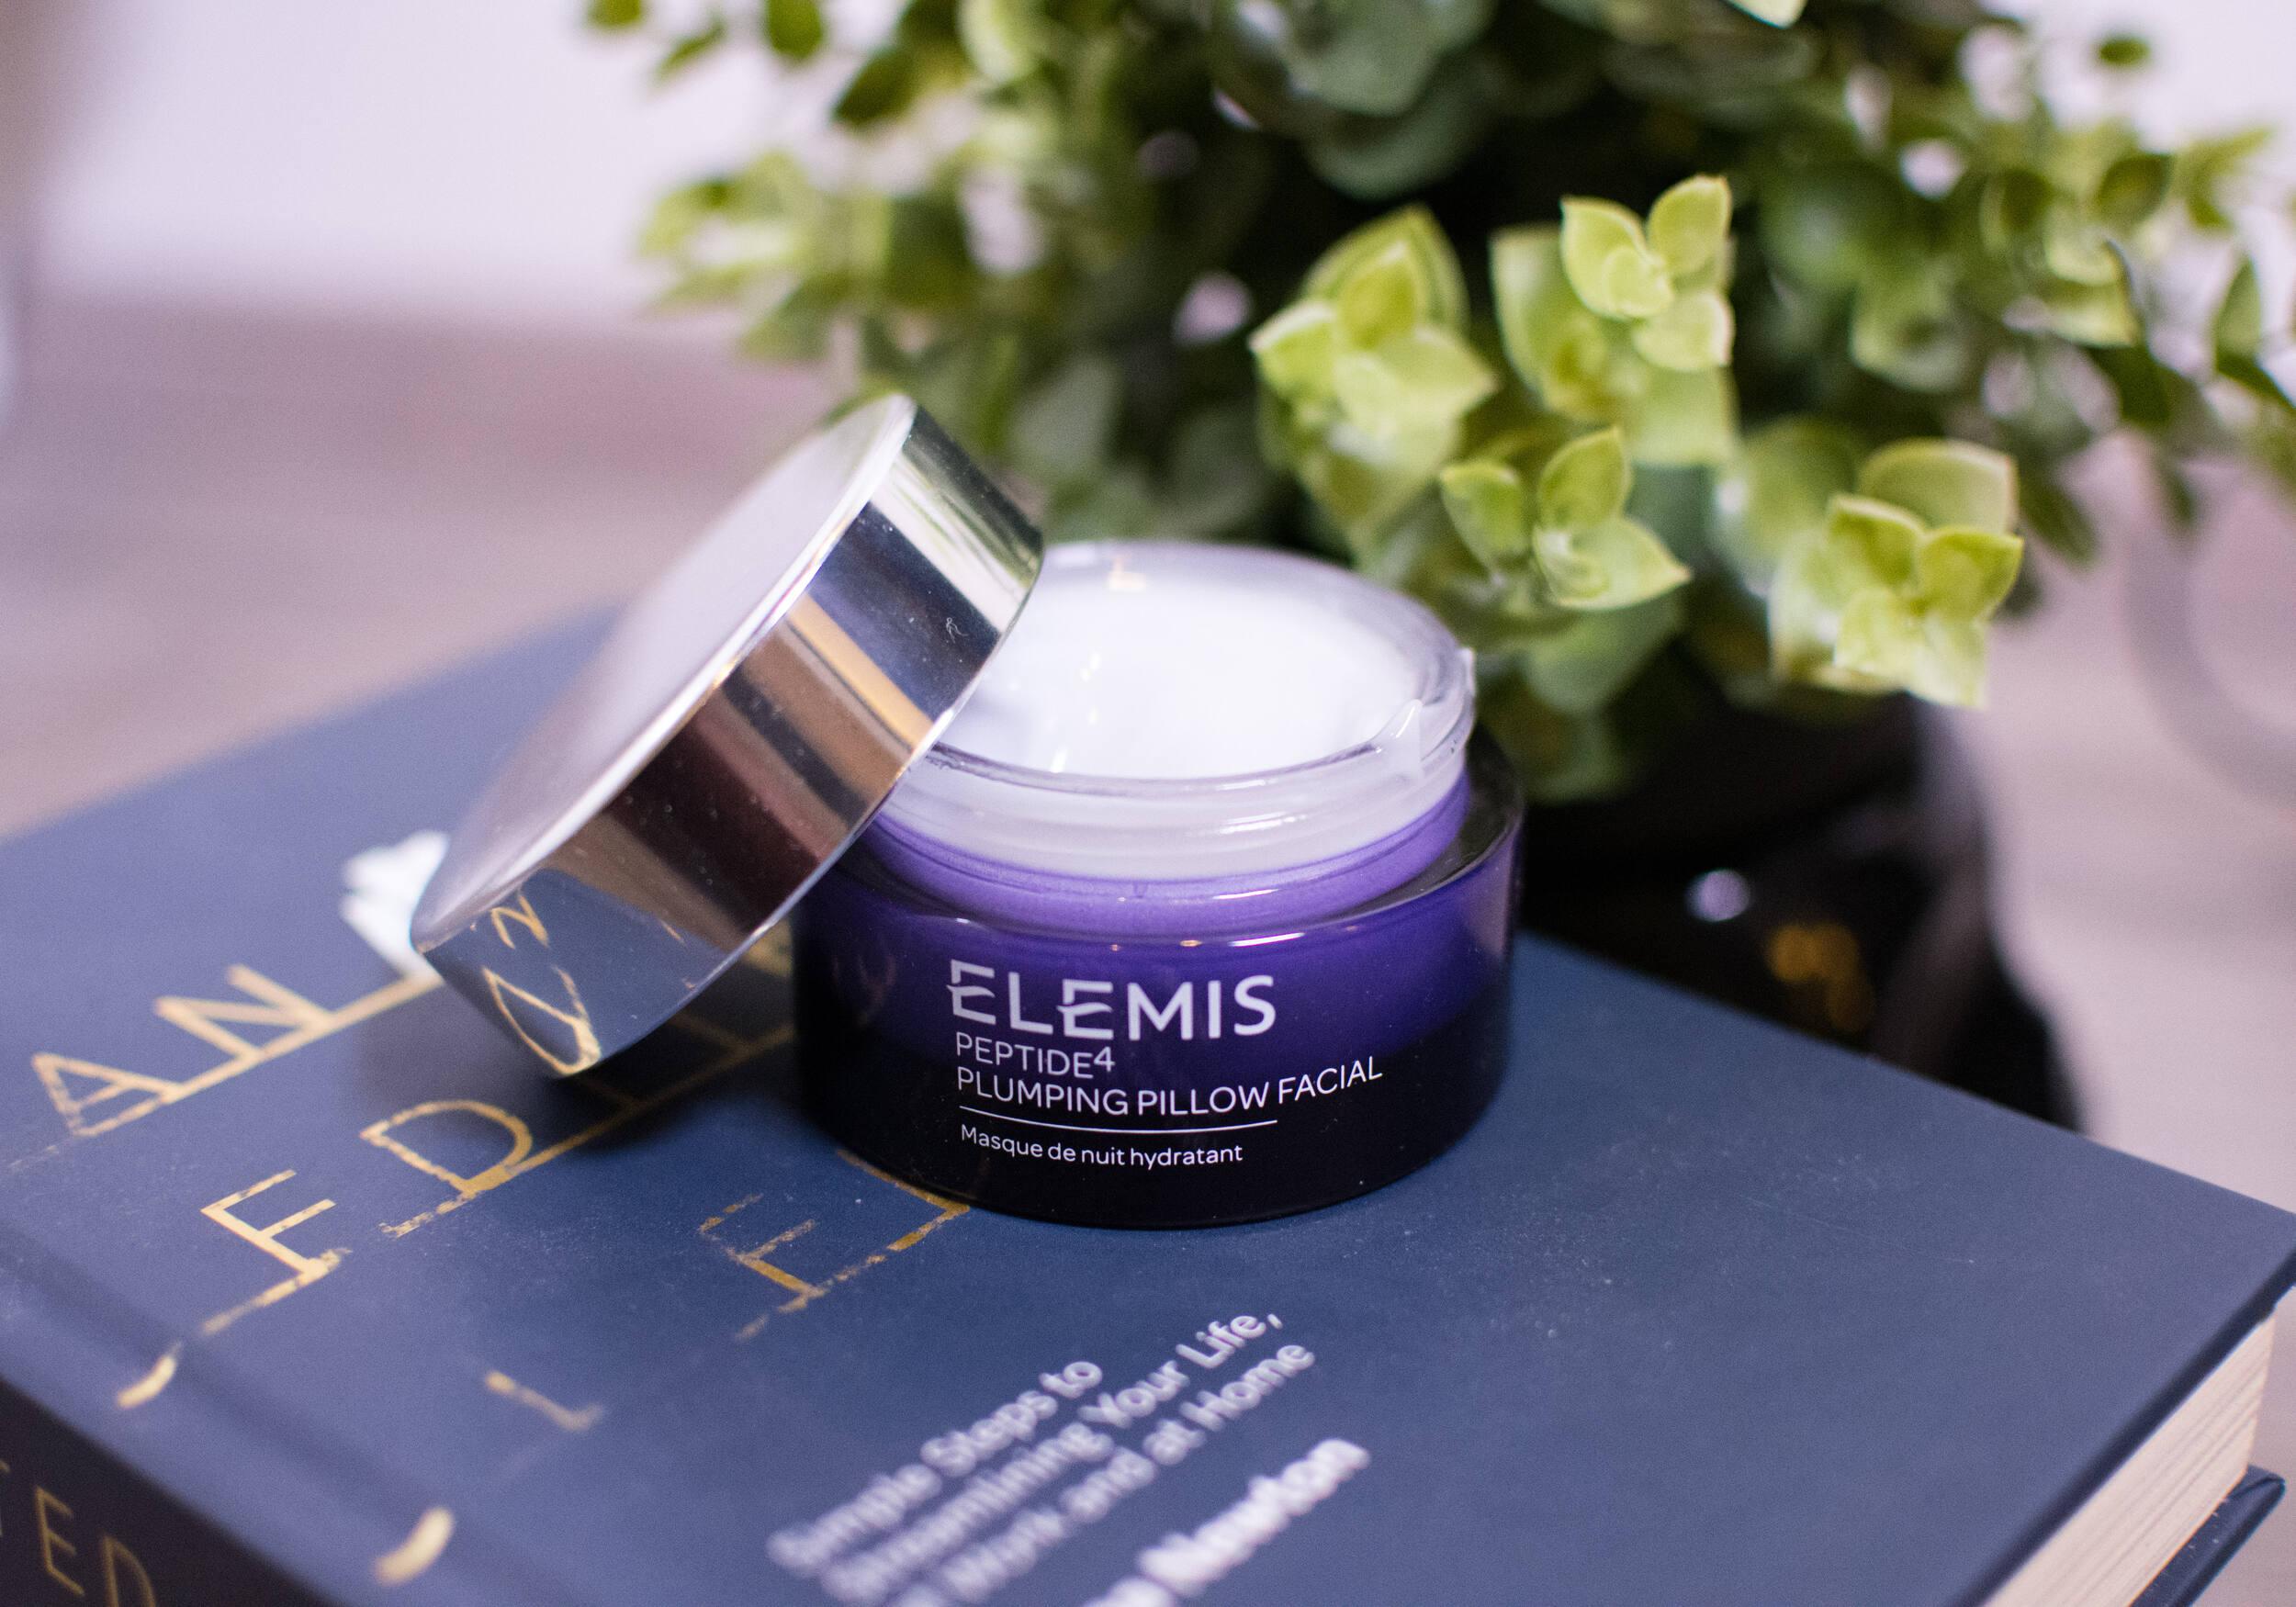 Elemis Peptide4 Plumping Facial Pillow